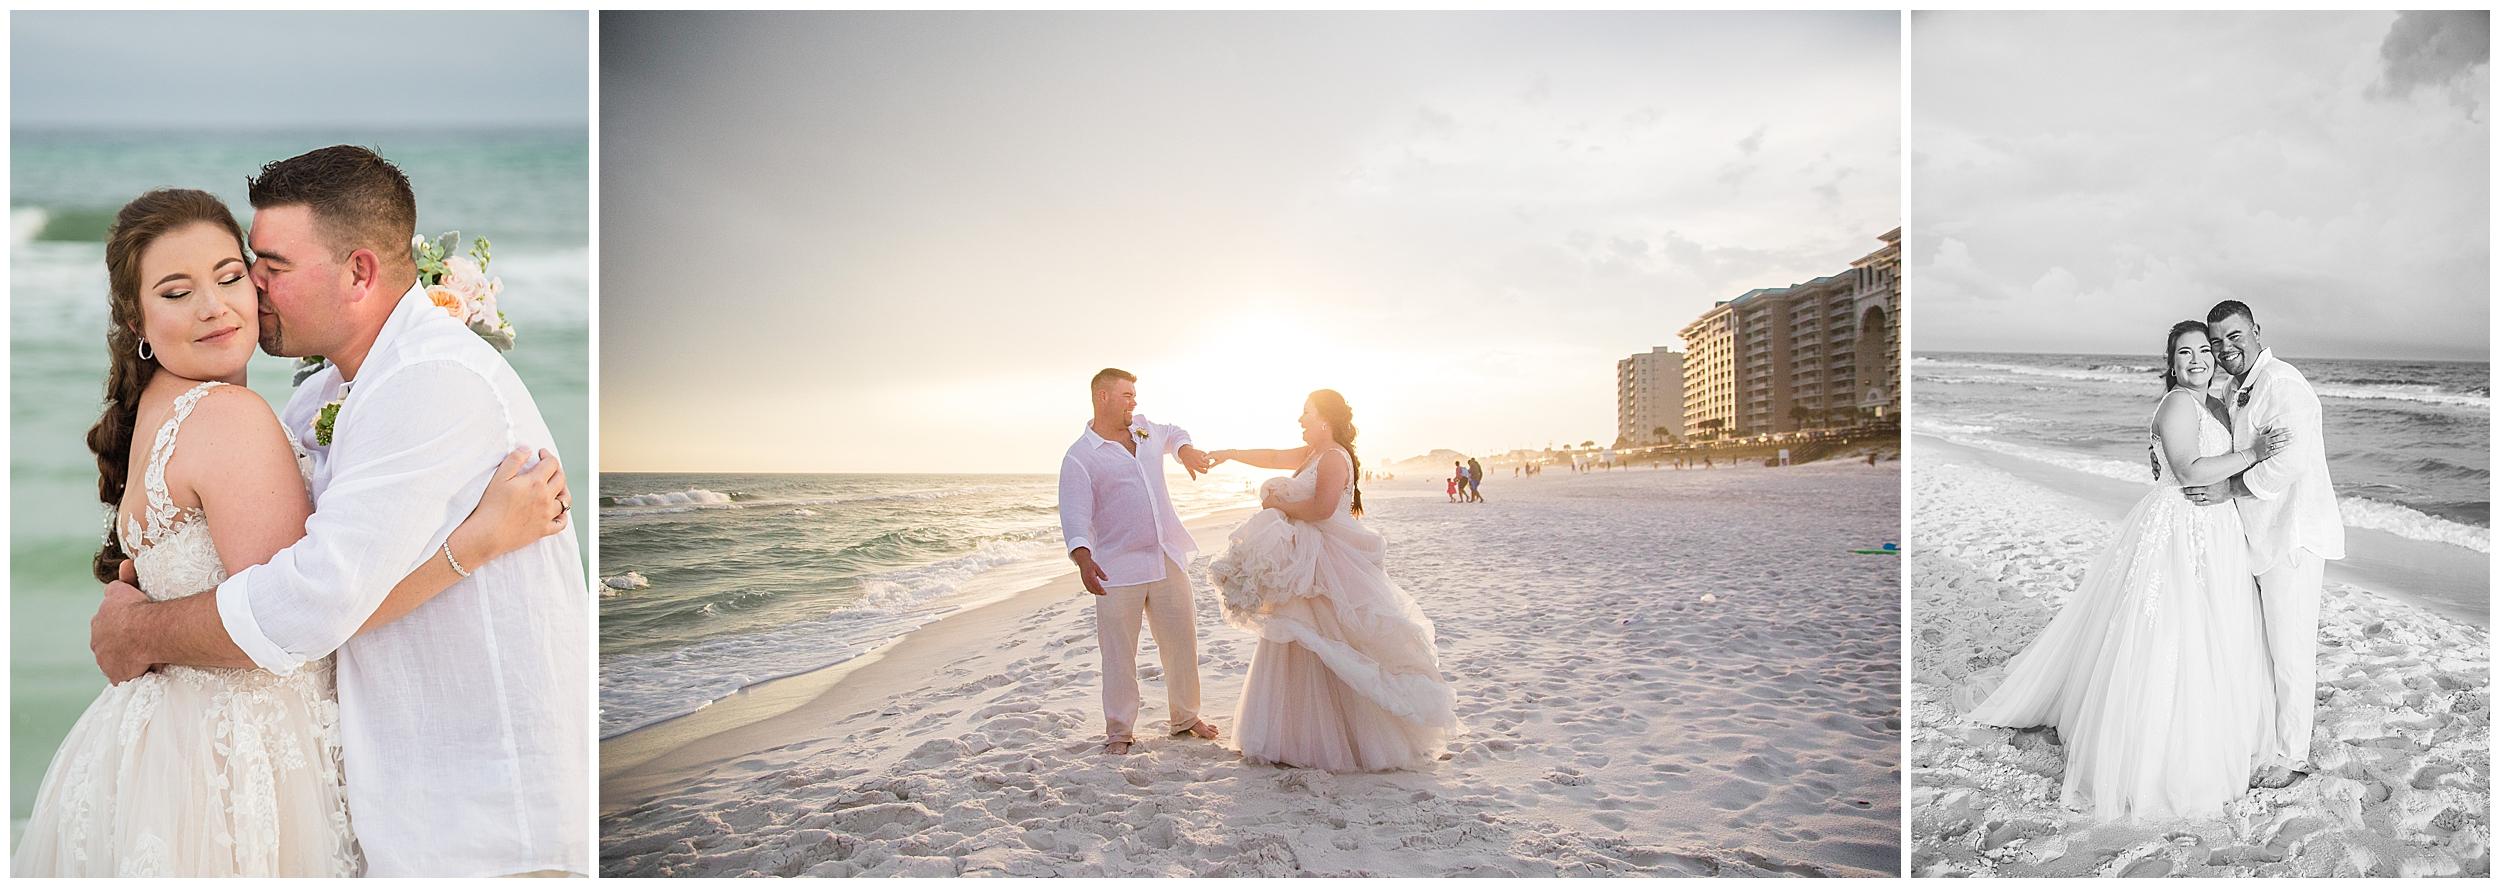 30a-Destin-Florida-Wedding-Photography-Jennie-Jeremy_0034.jpg